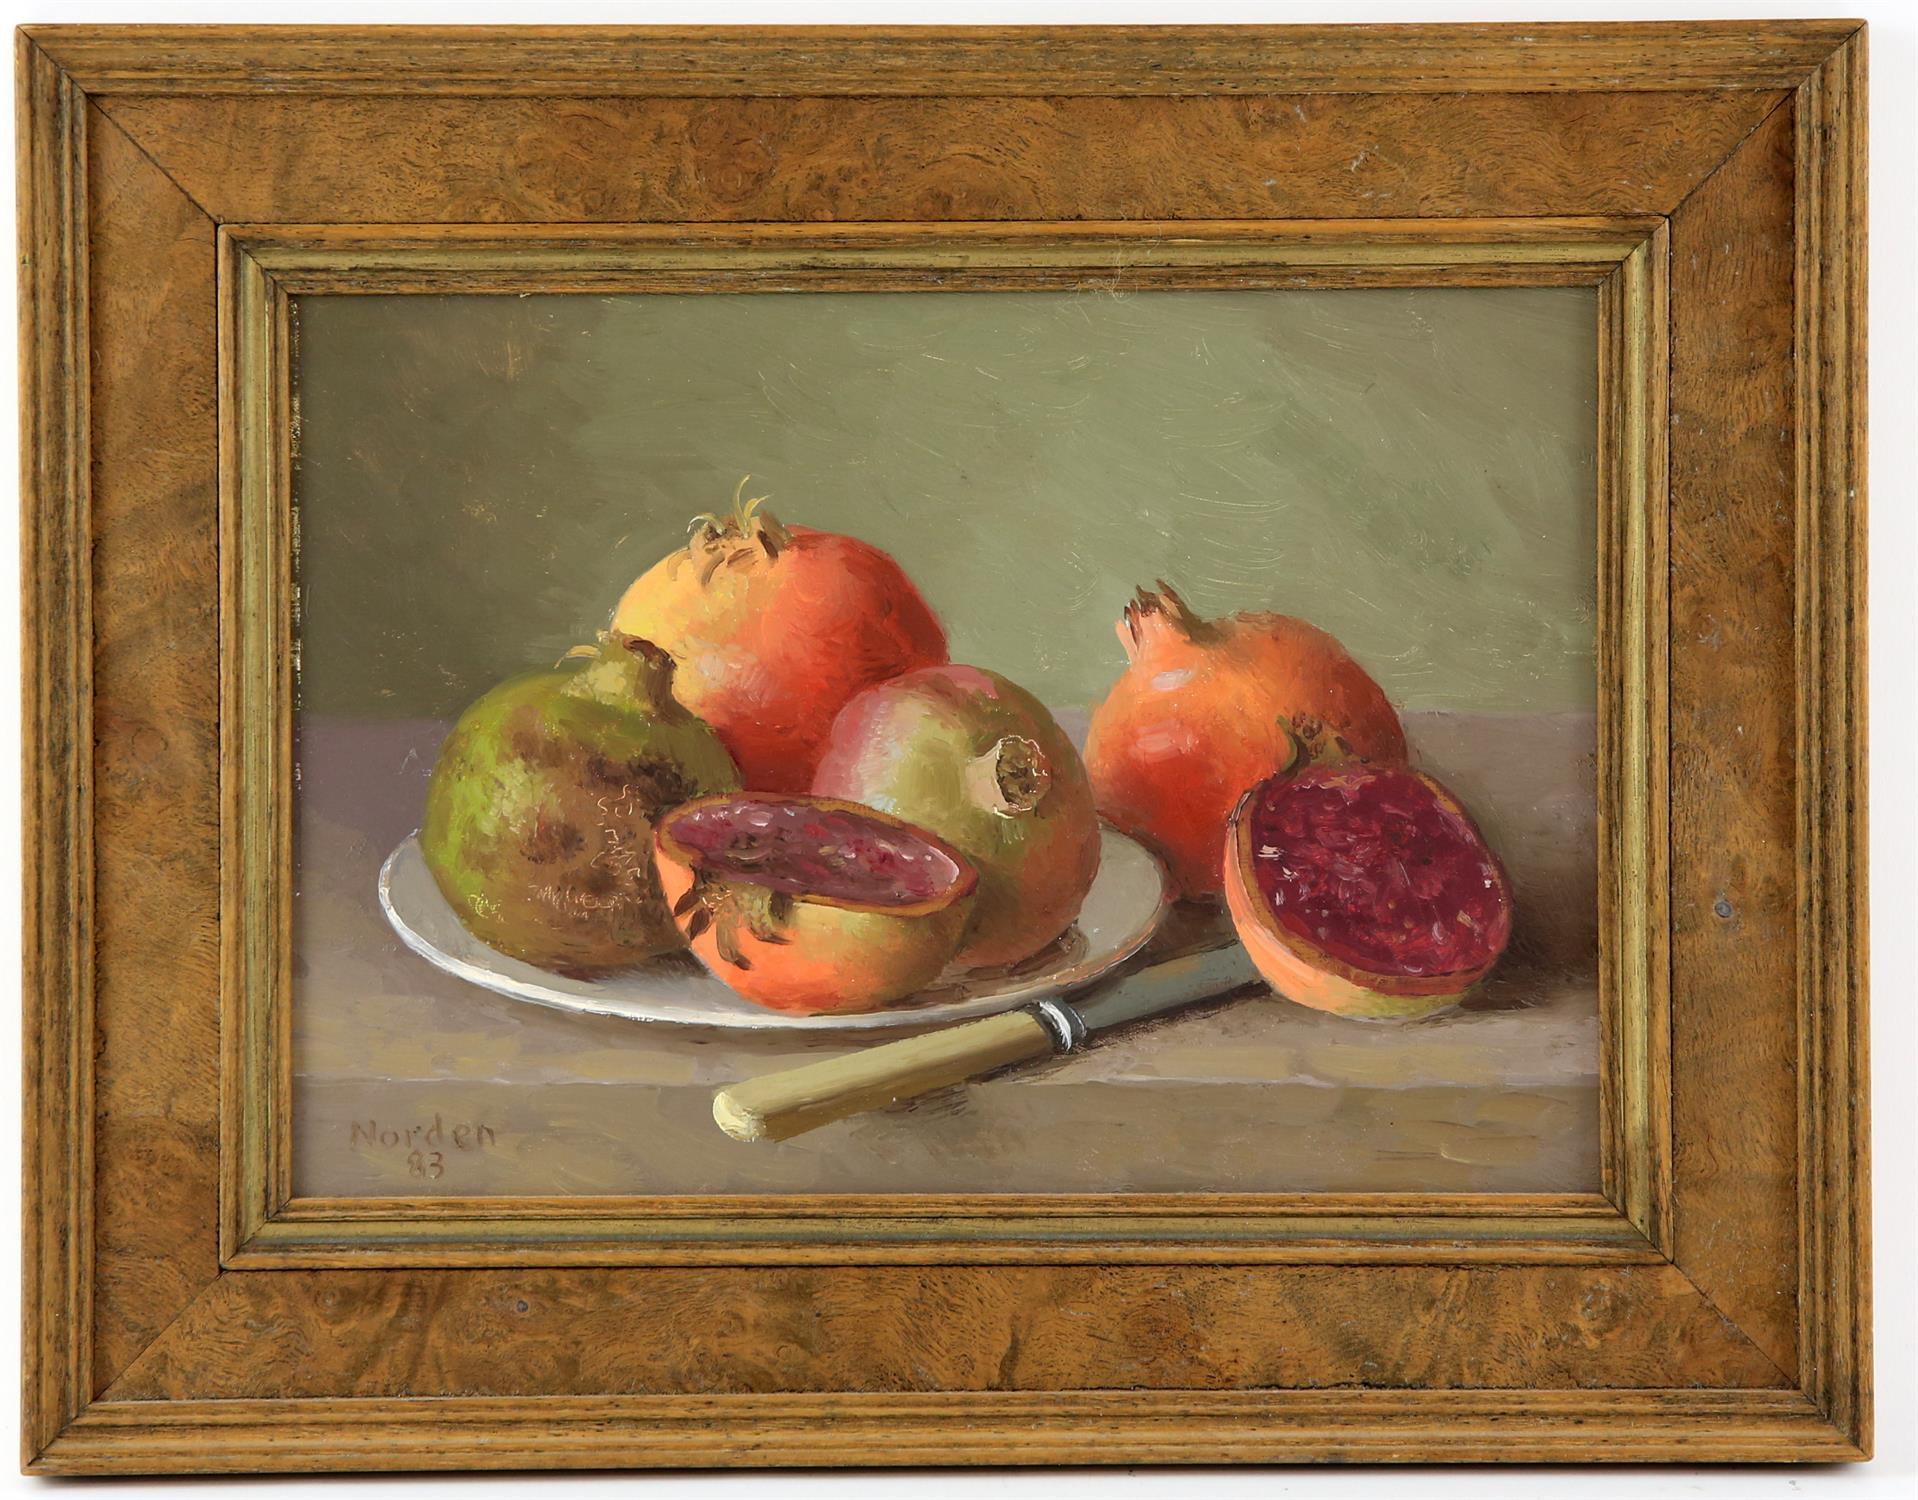 Gerald Norden (British,1912-2000). 'Pomegranates'. Oil on board 1983. Signed lower left. - Image 2 of 2